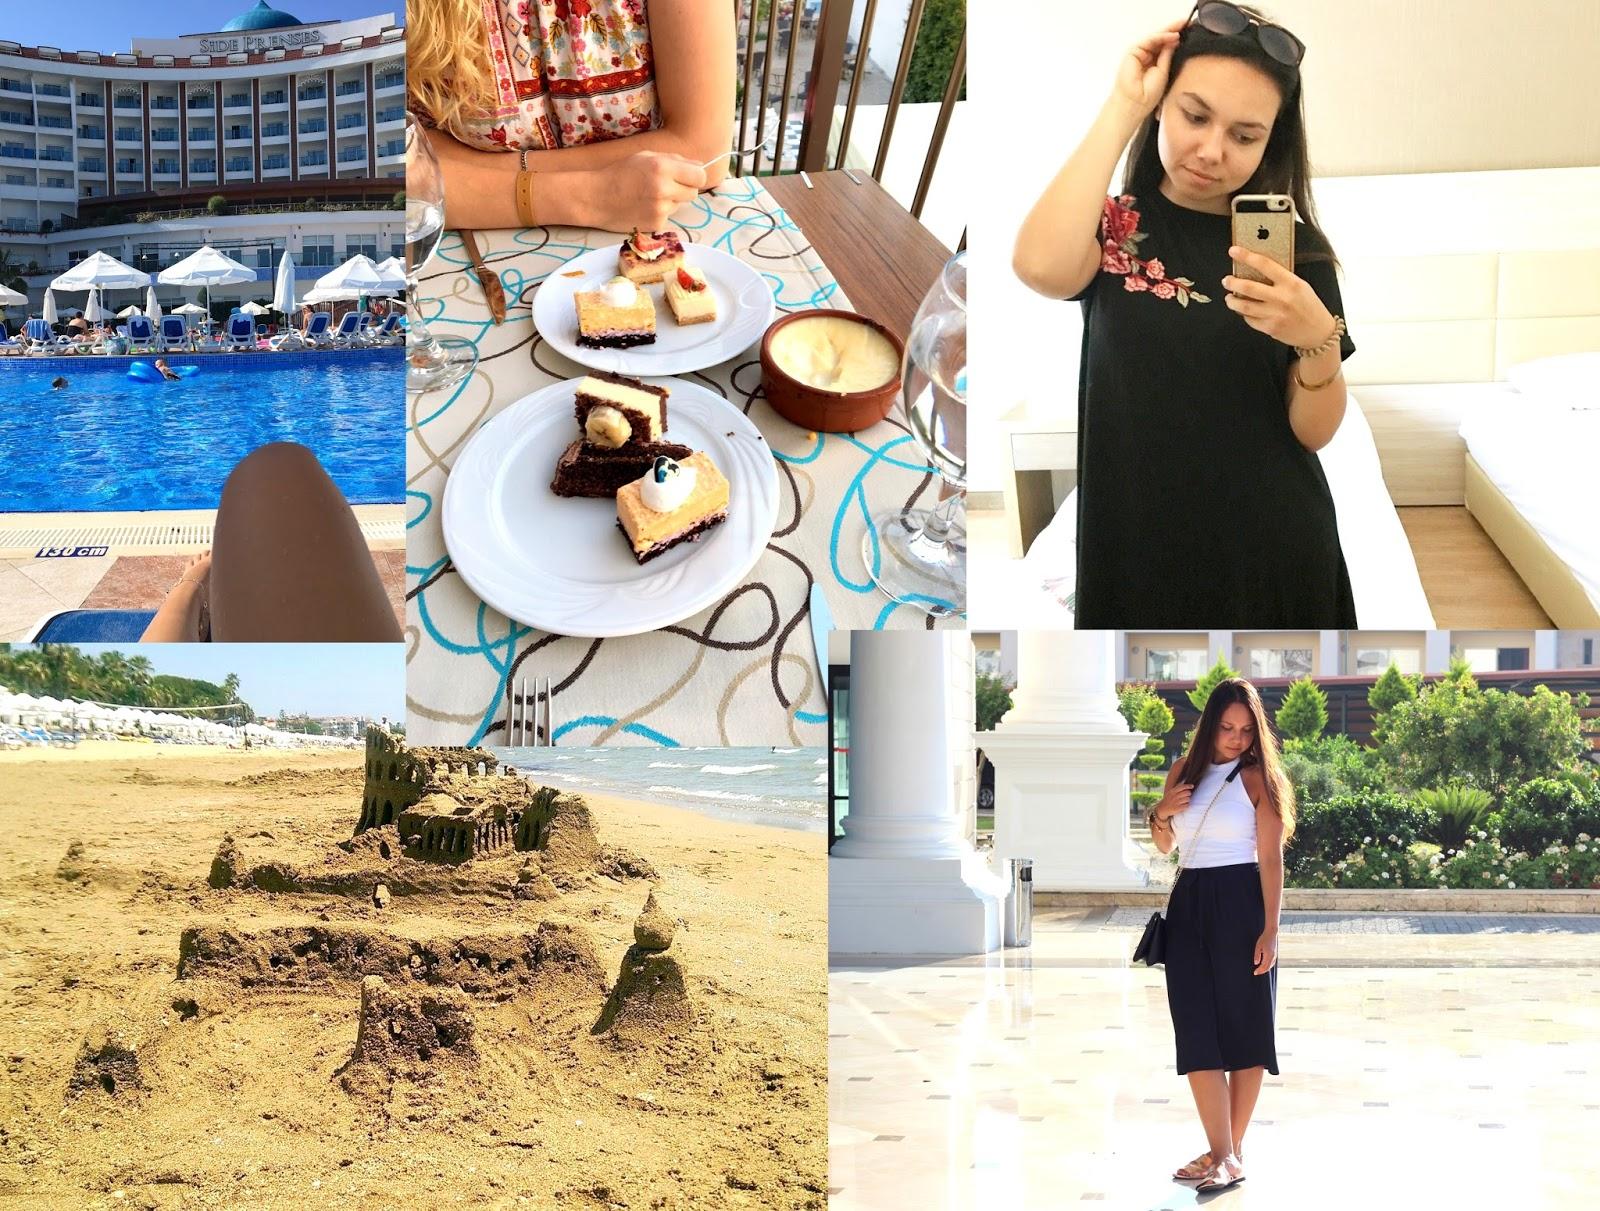 Bloggerleben Juni 2017